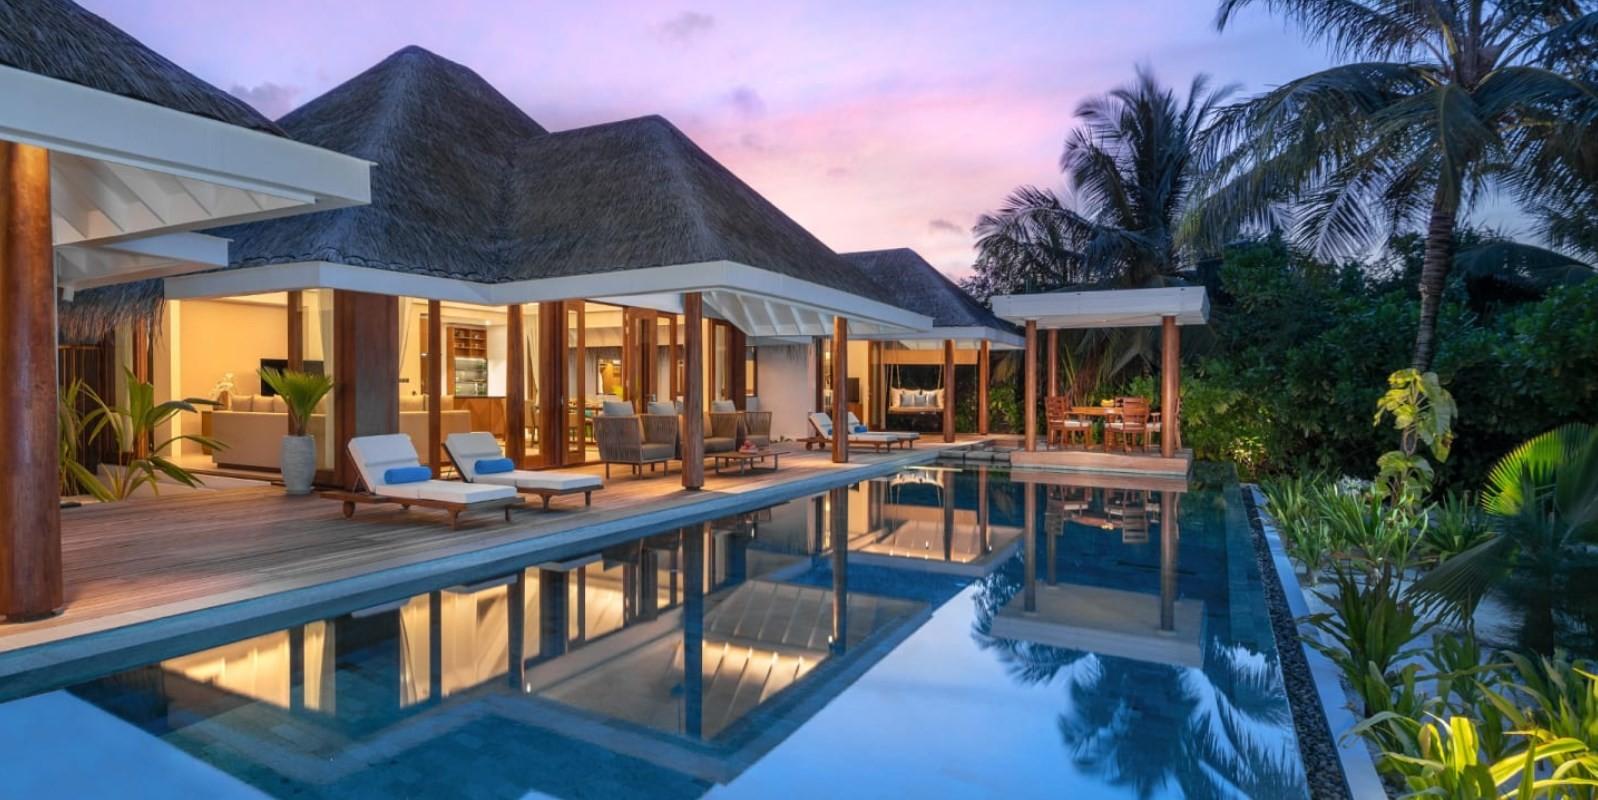 news-main-anantara-kihavah-maldives-villas-unveils-collection-of-expansive-private-pool-residences.1616706085.jpg